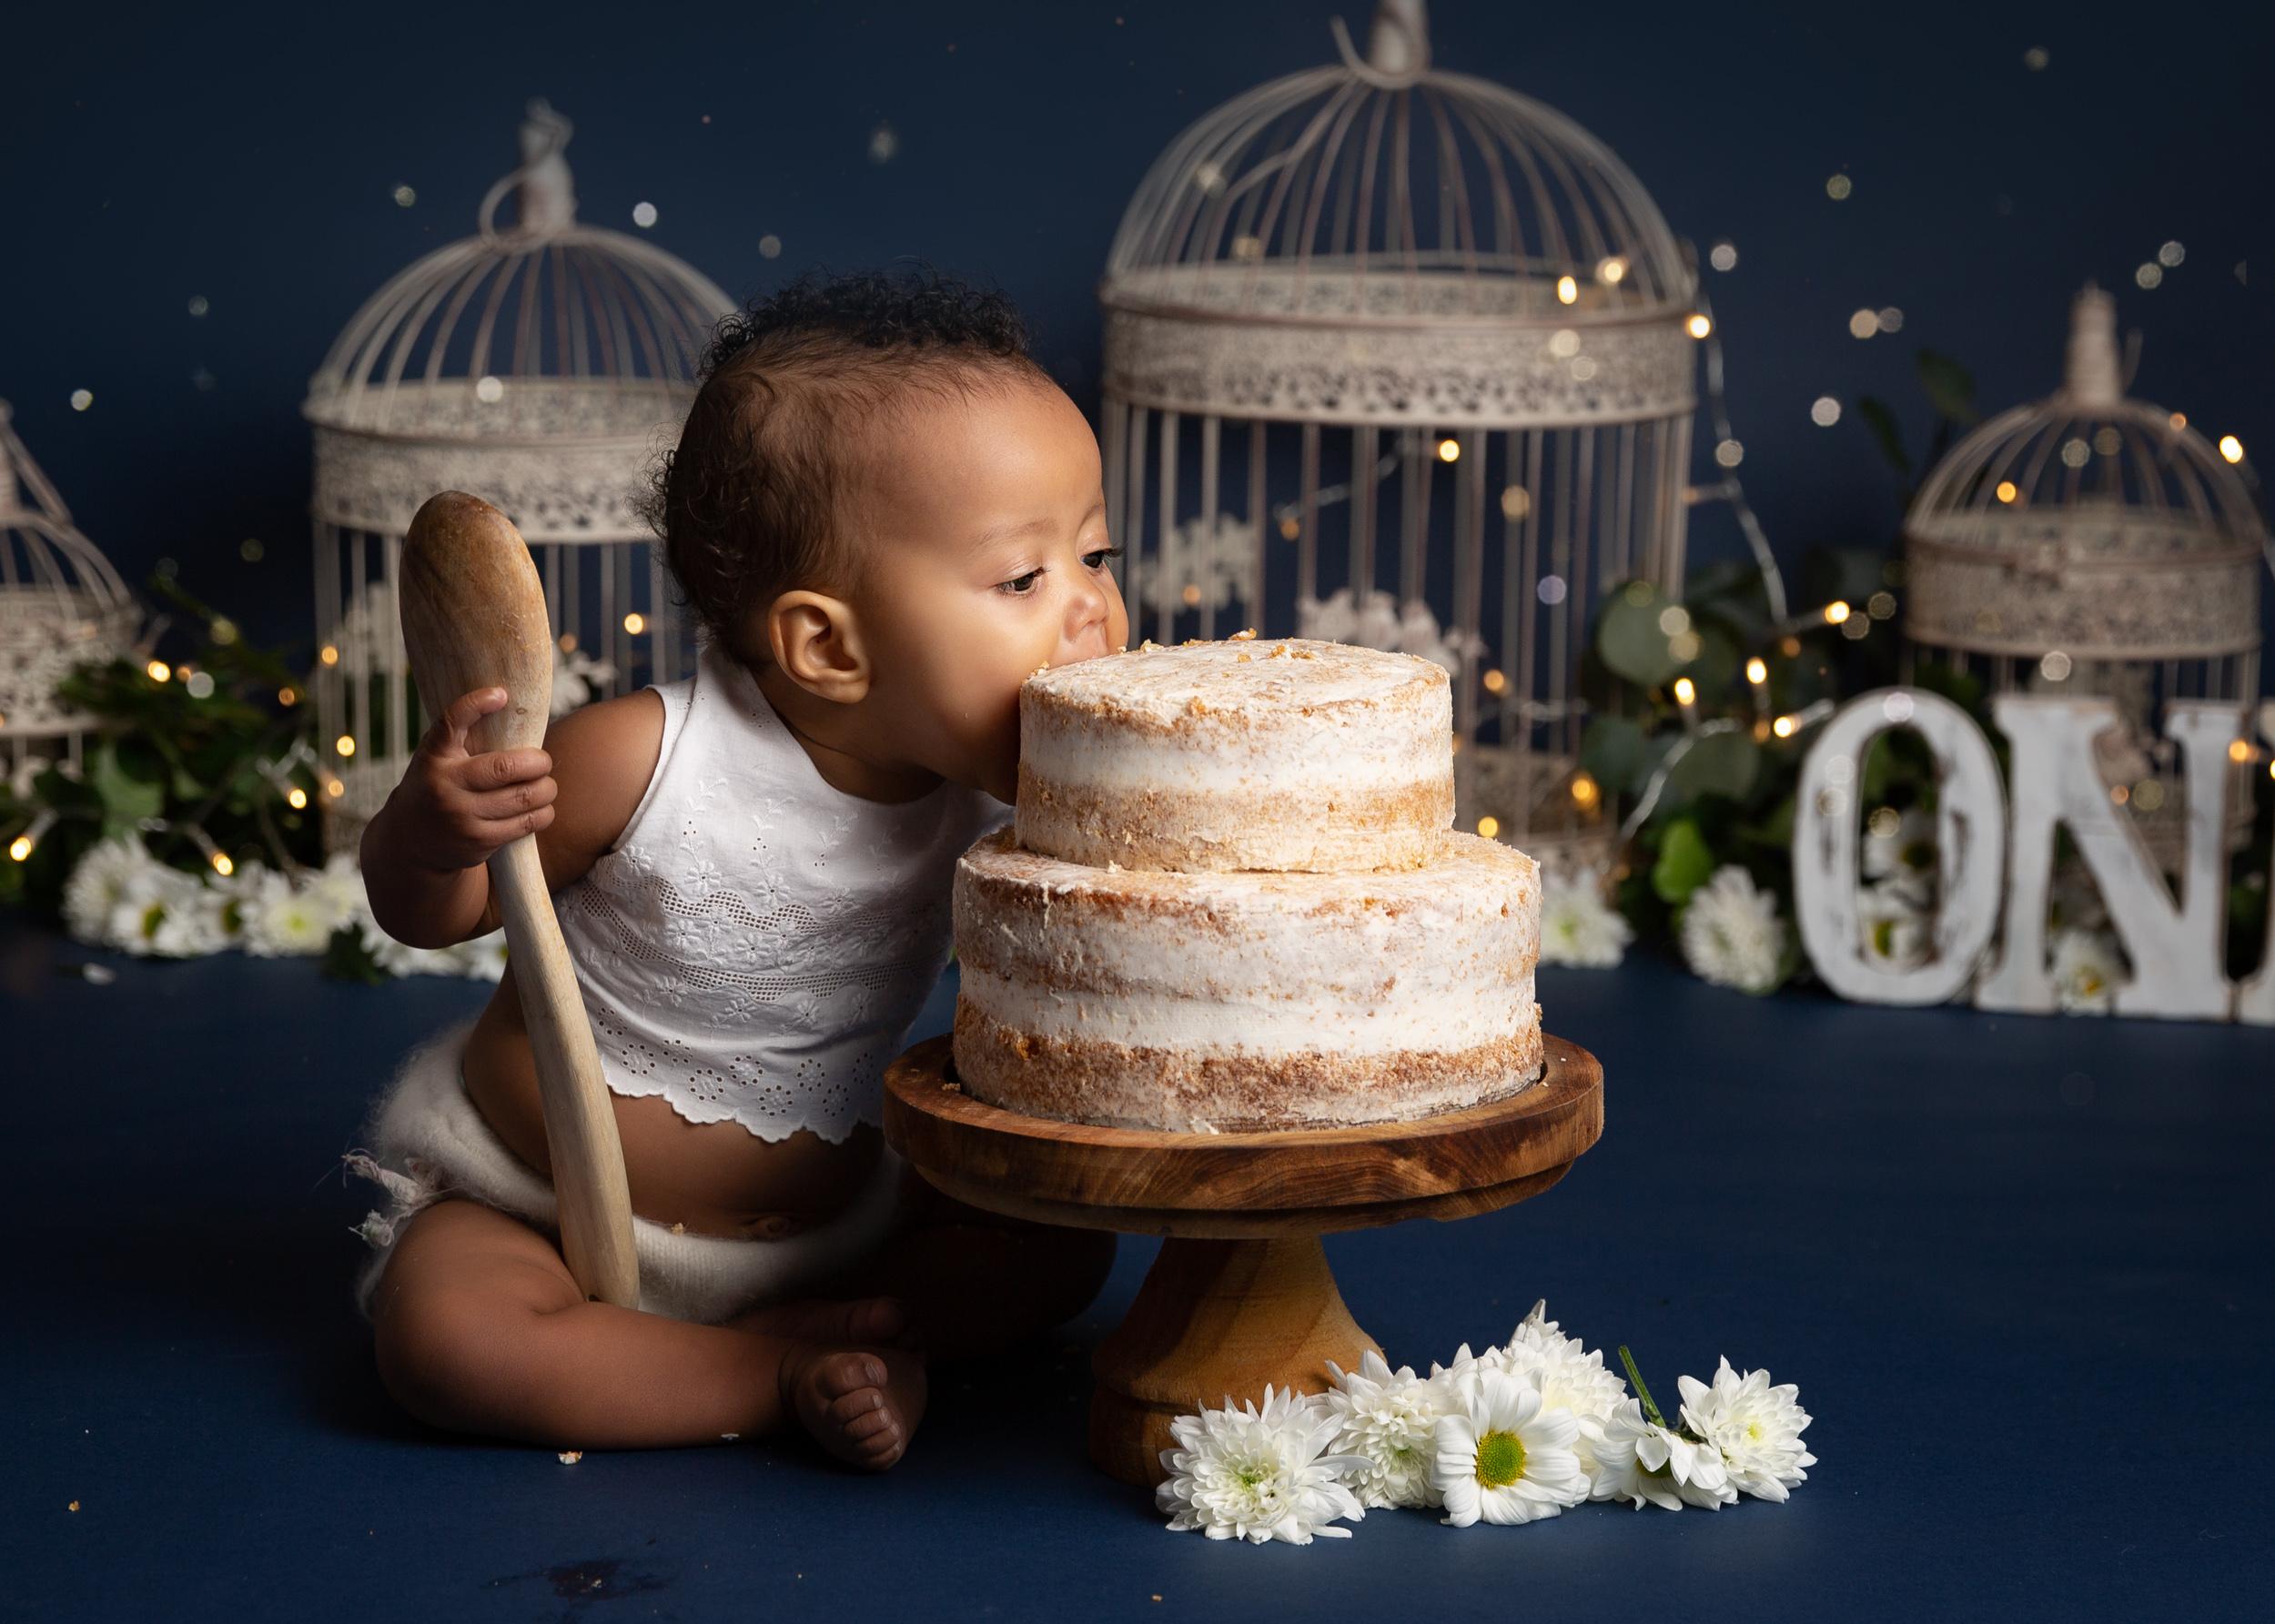 Little girl munching her cake during her photo shoot in Cheshire